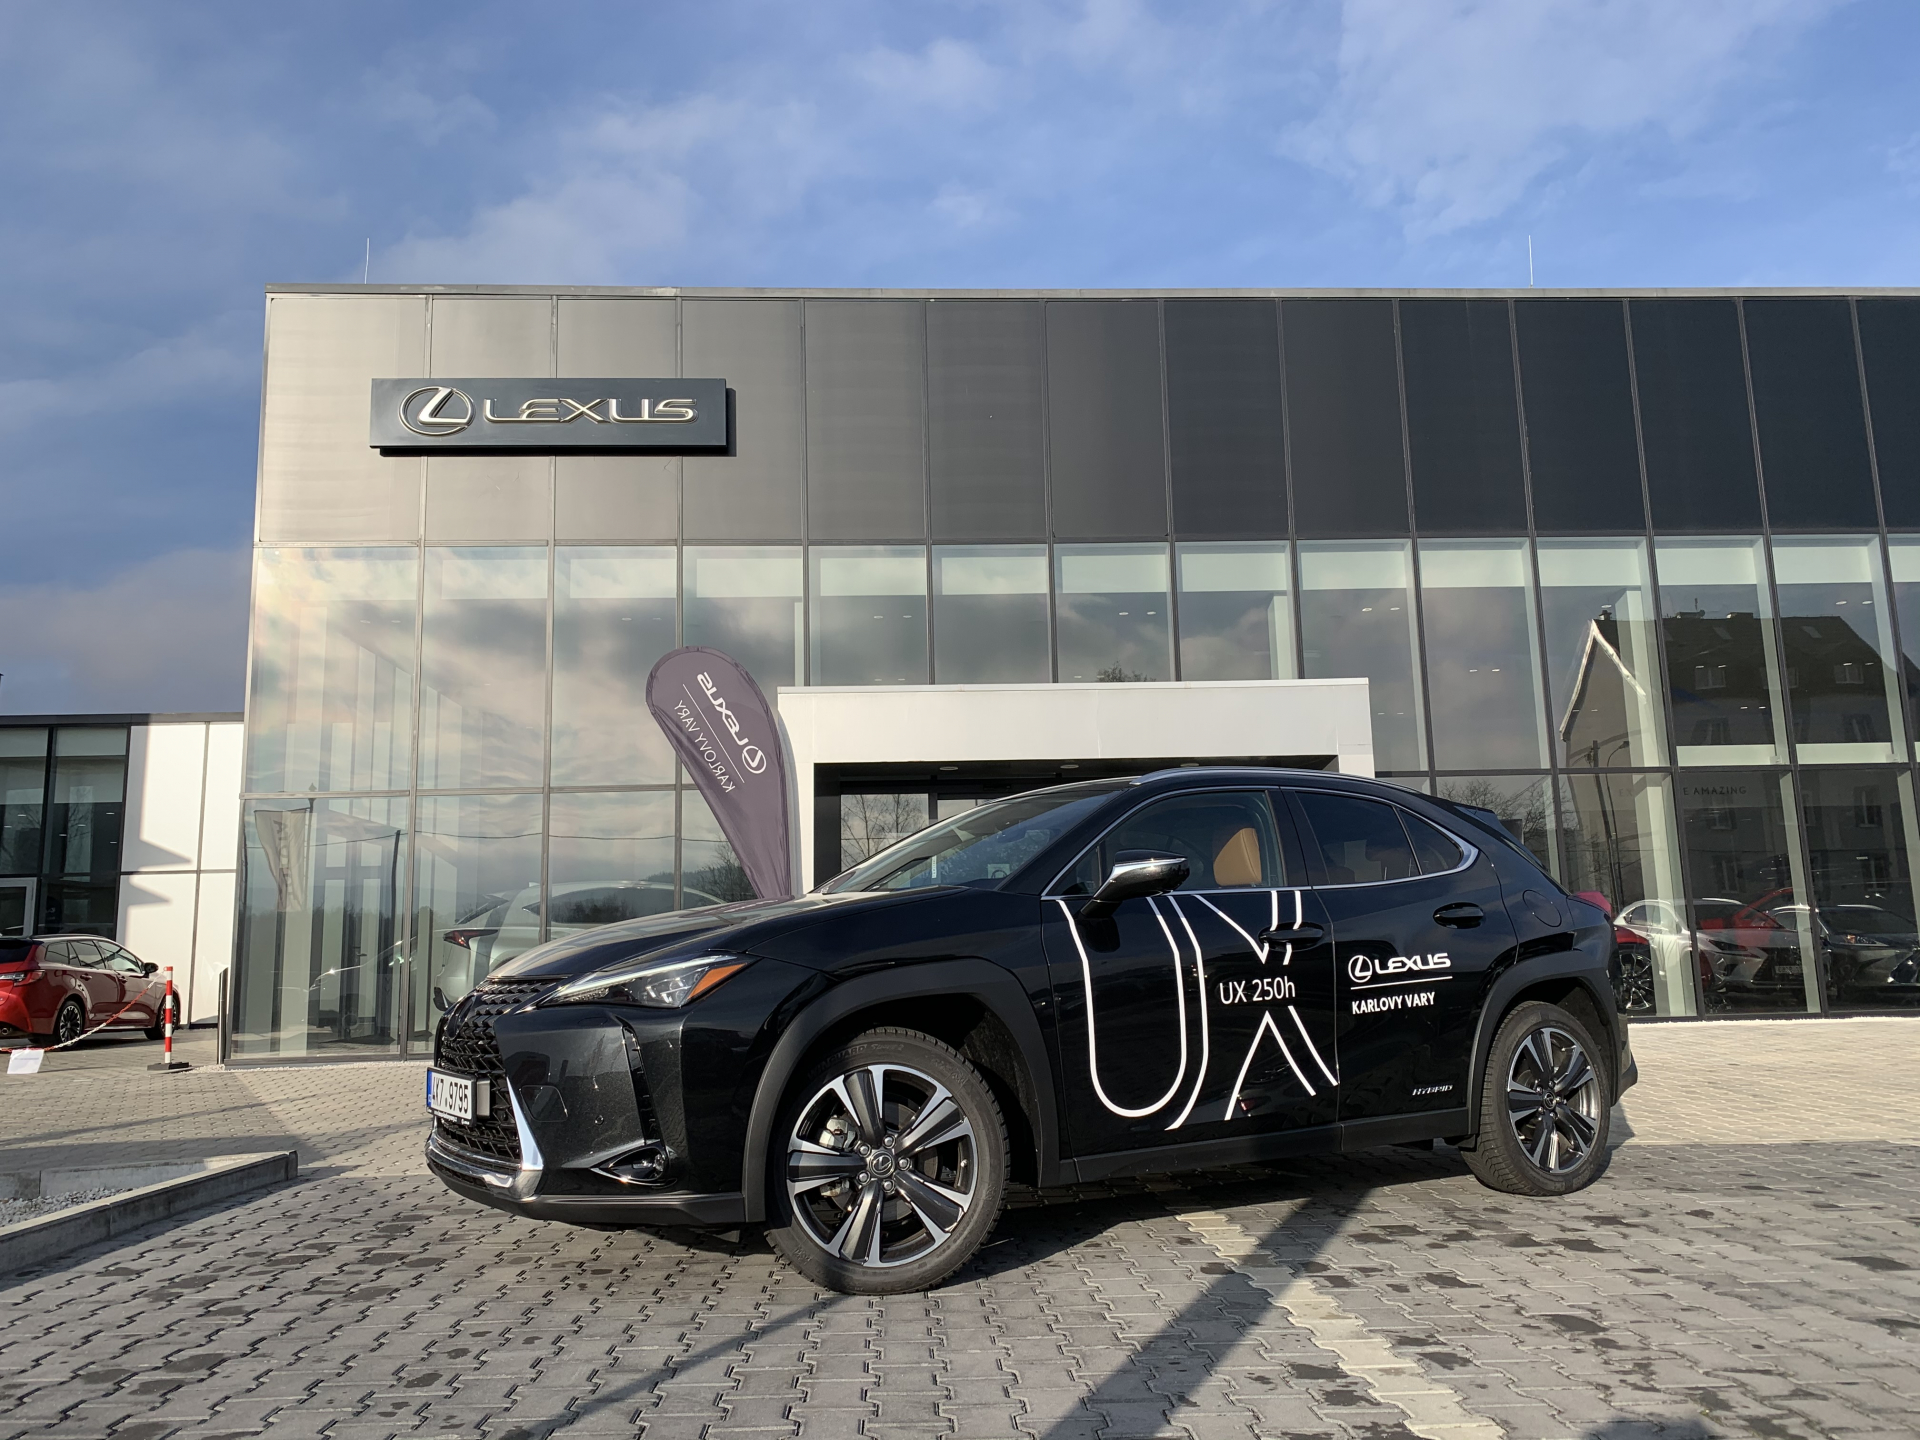 Lexus UX 250h 2.0 L Petrol Hybrid (184 k) aut. e-CVT (4X4) Prestige